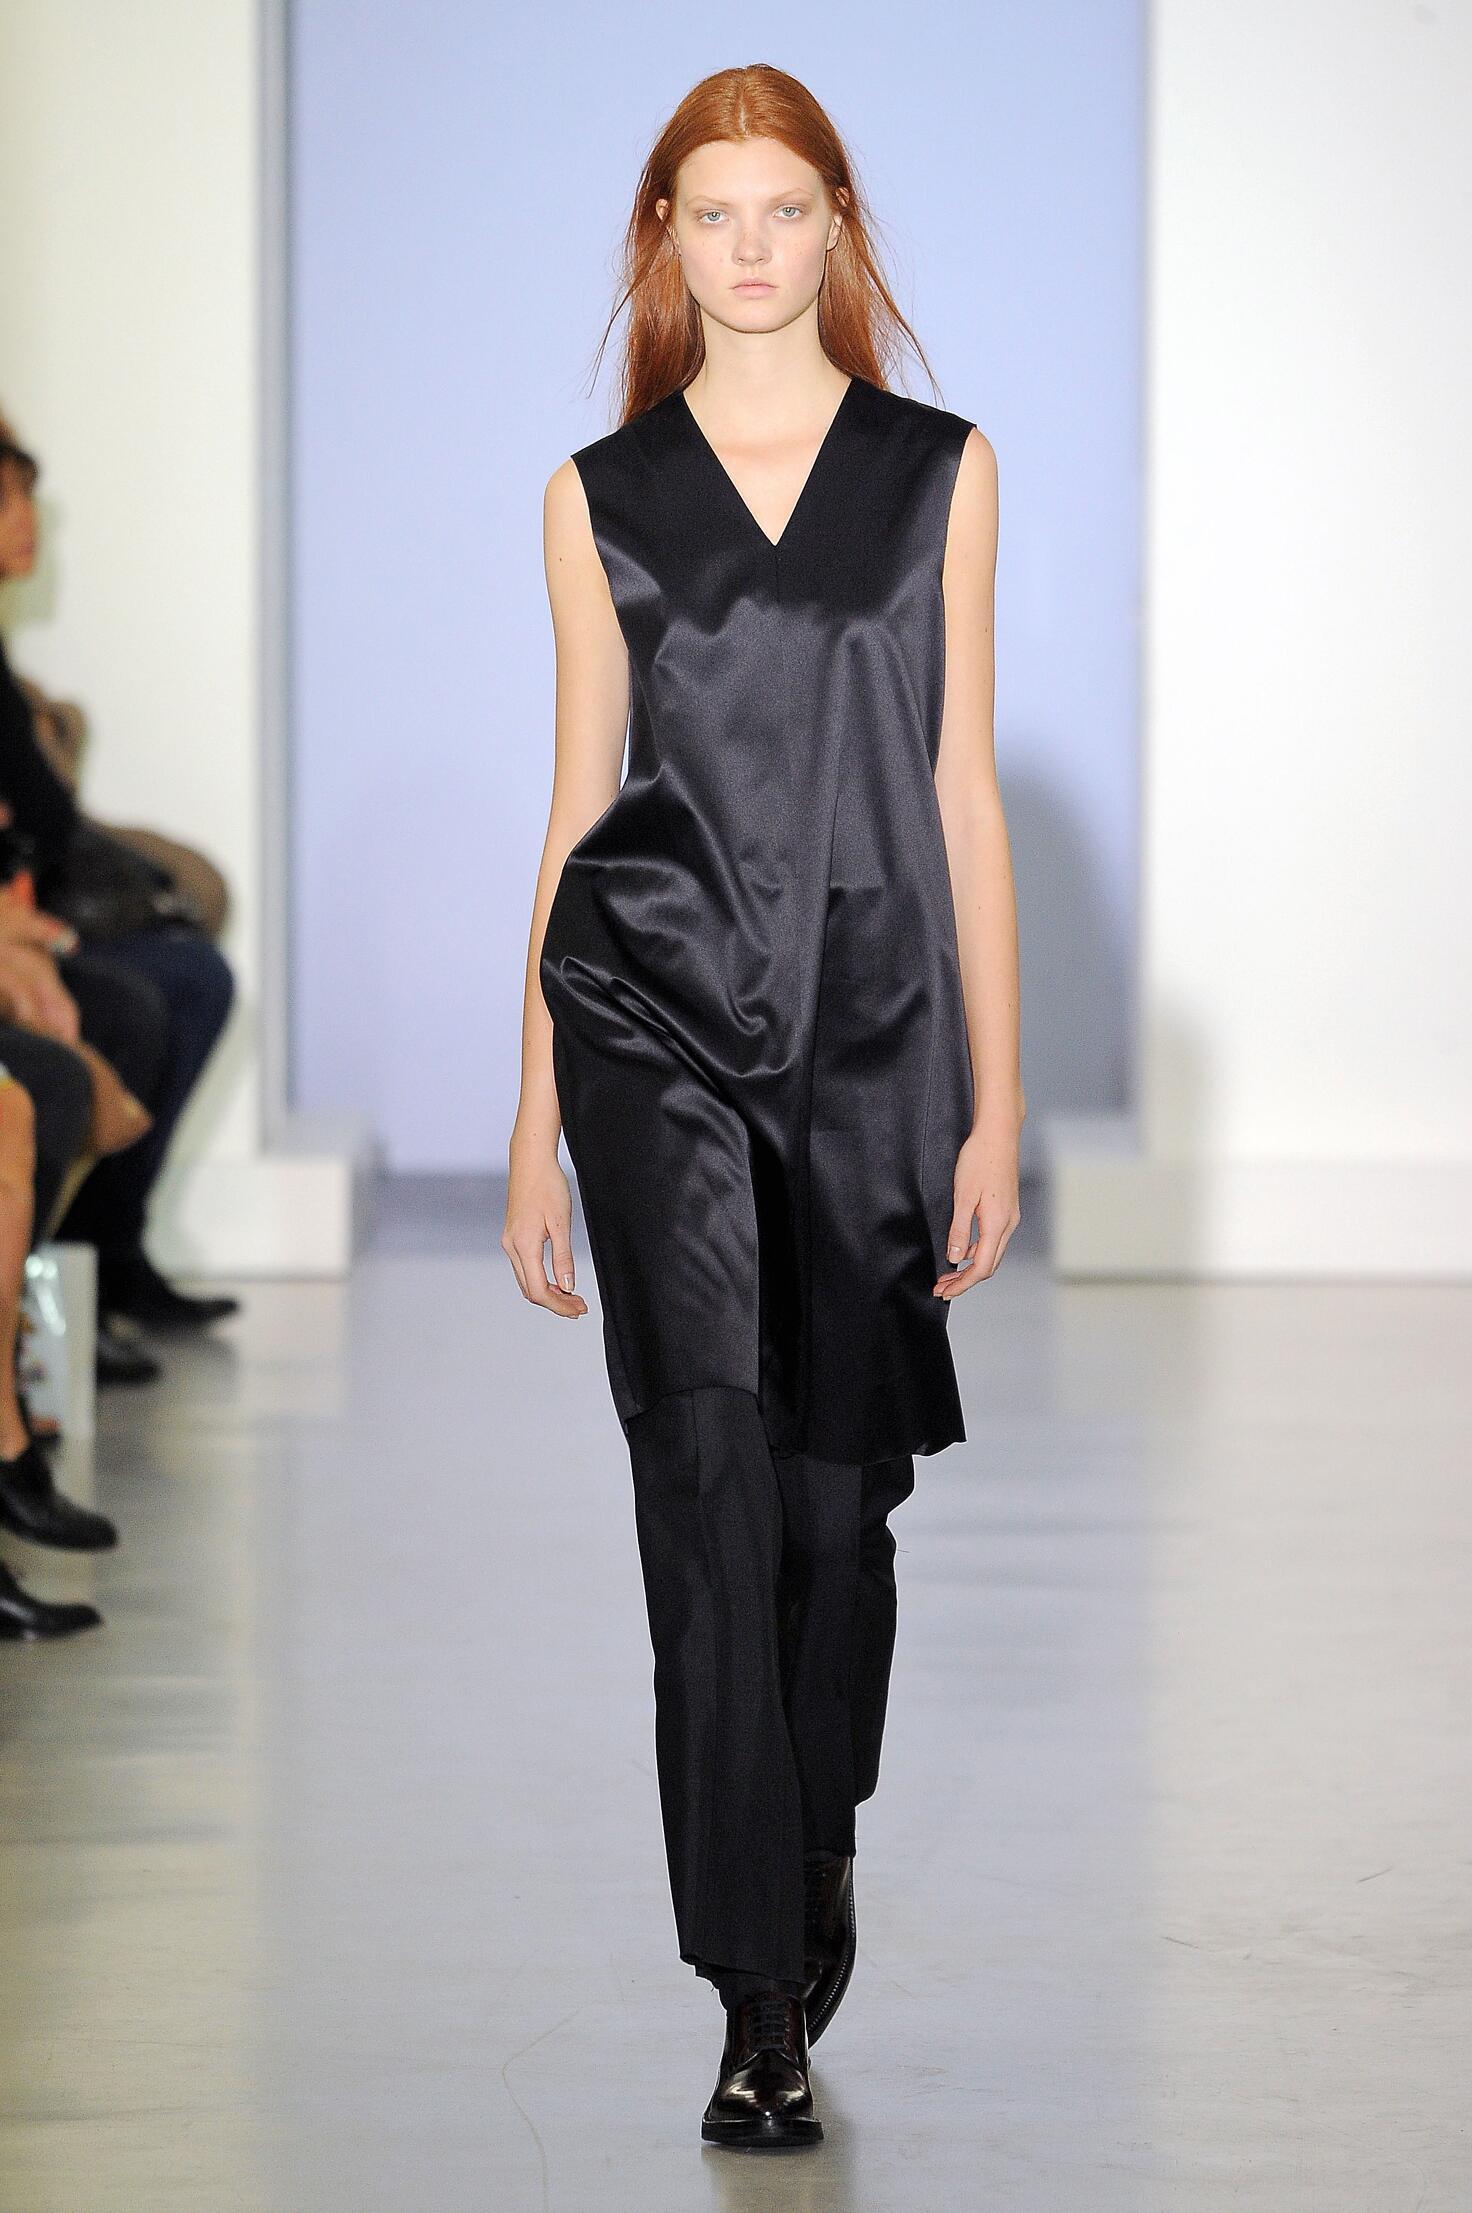 Spring Summer 2015 Fashion Model Yang Li